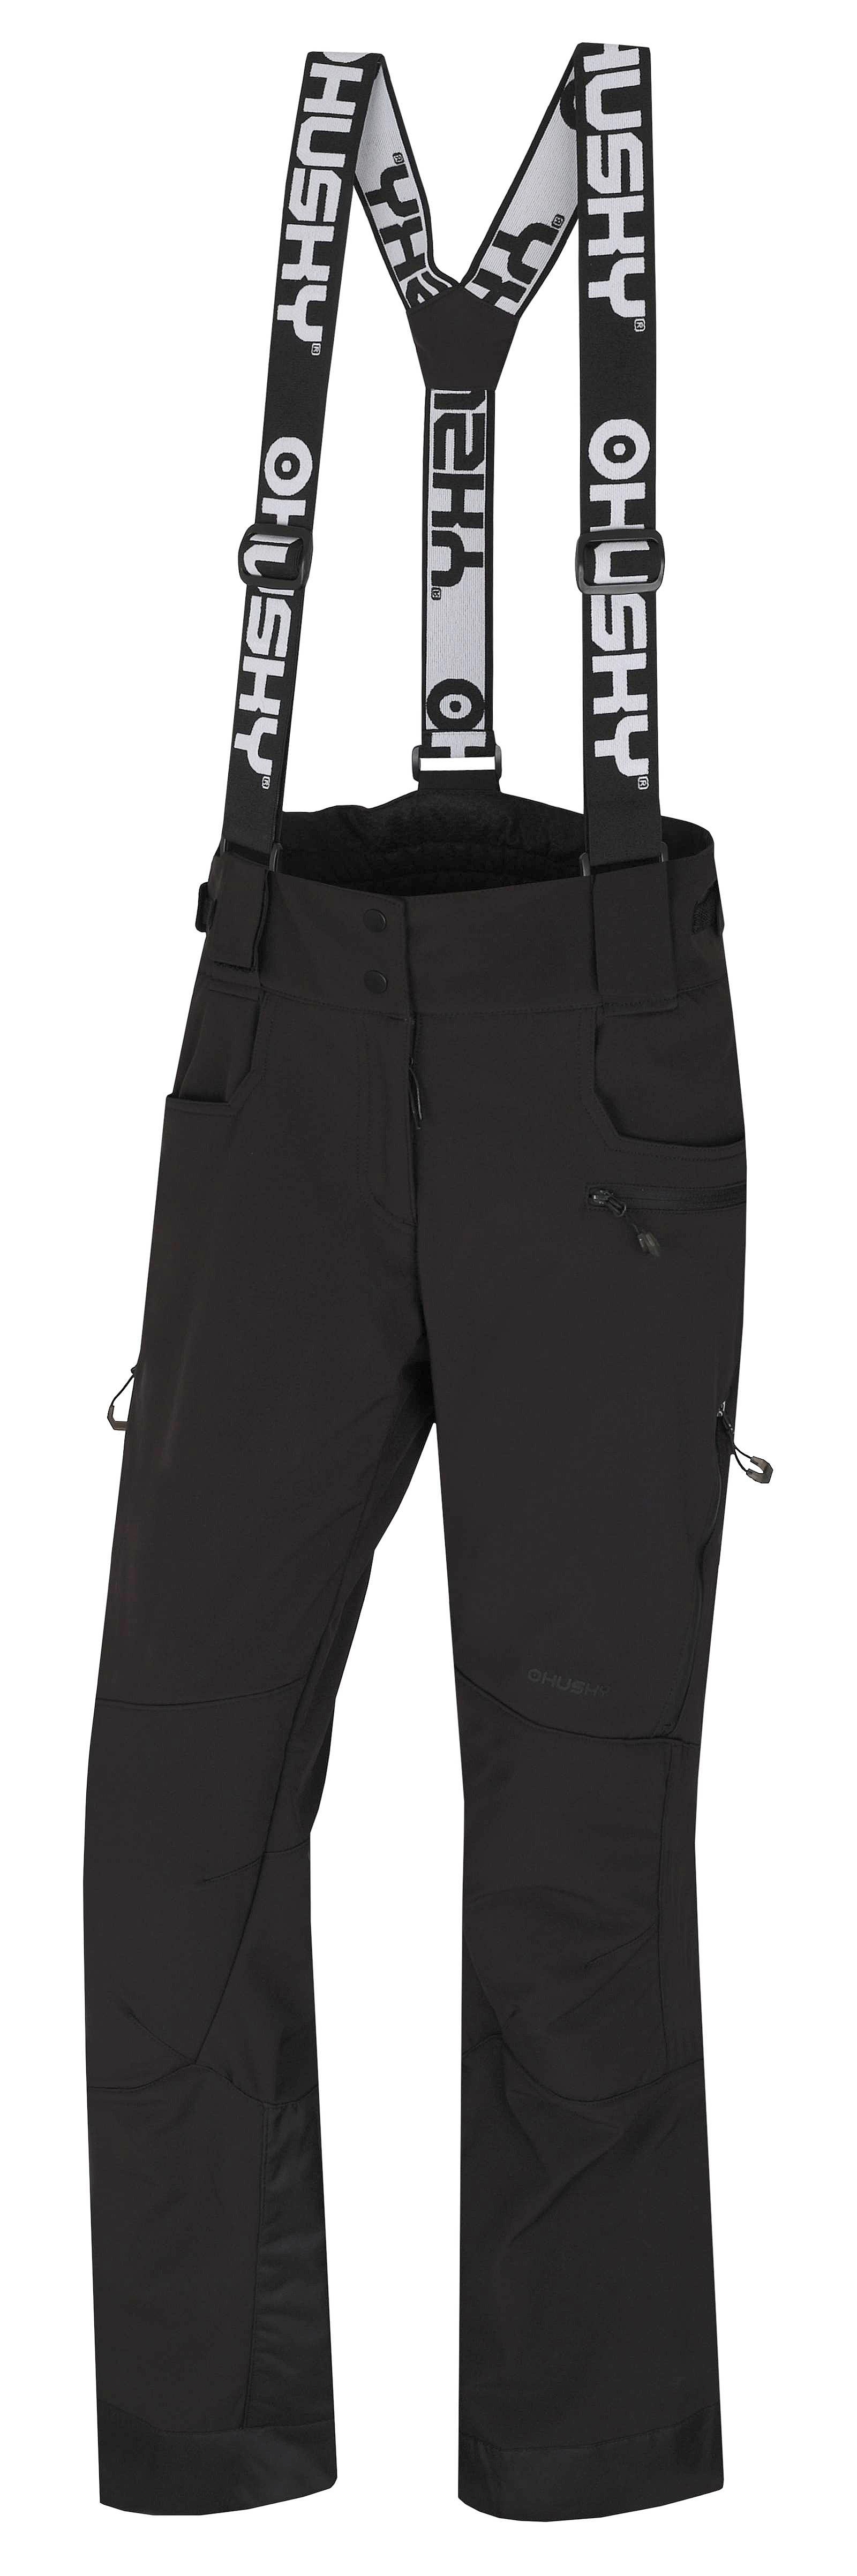 kalhoty Husky Galti L - Black L